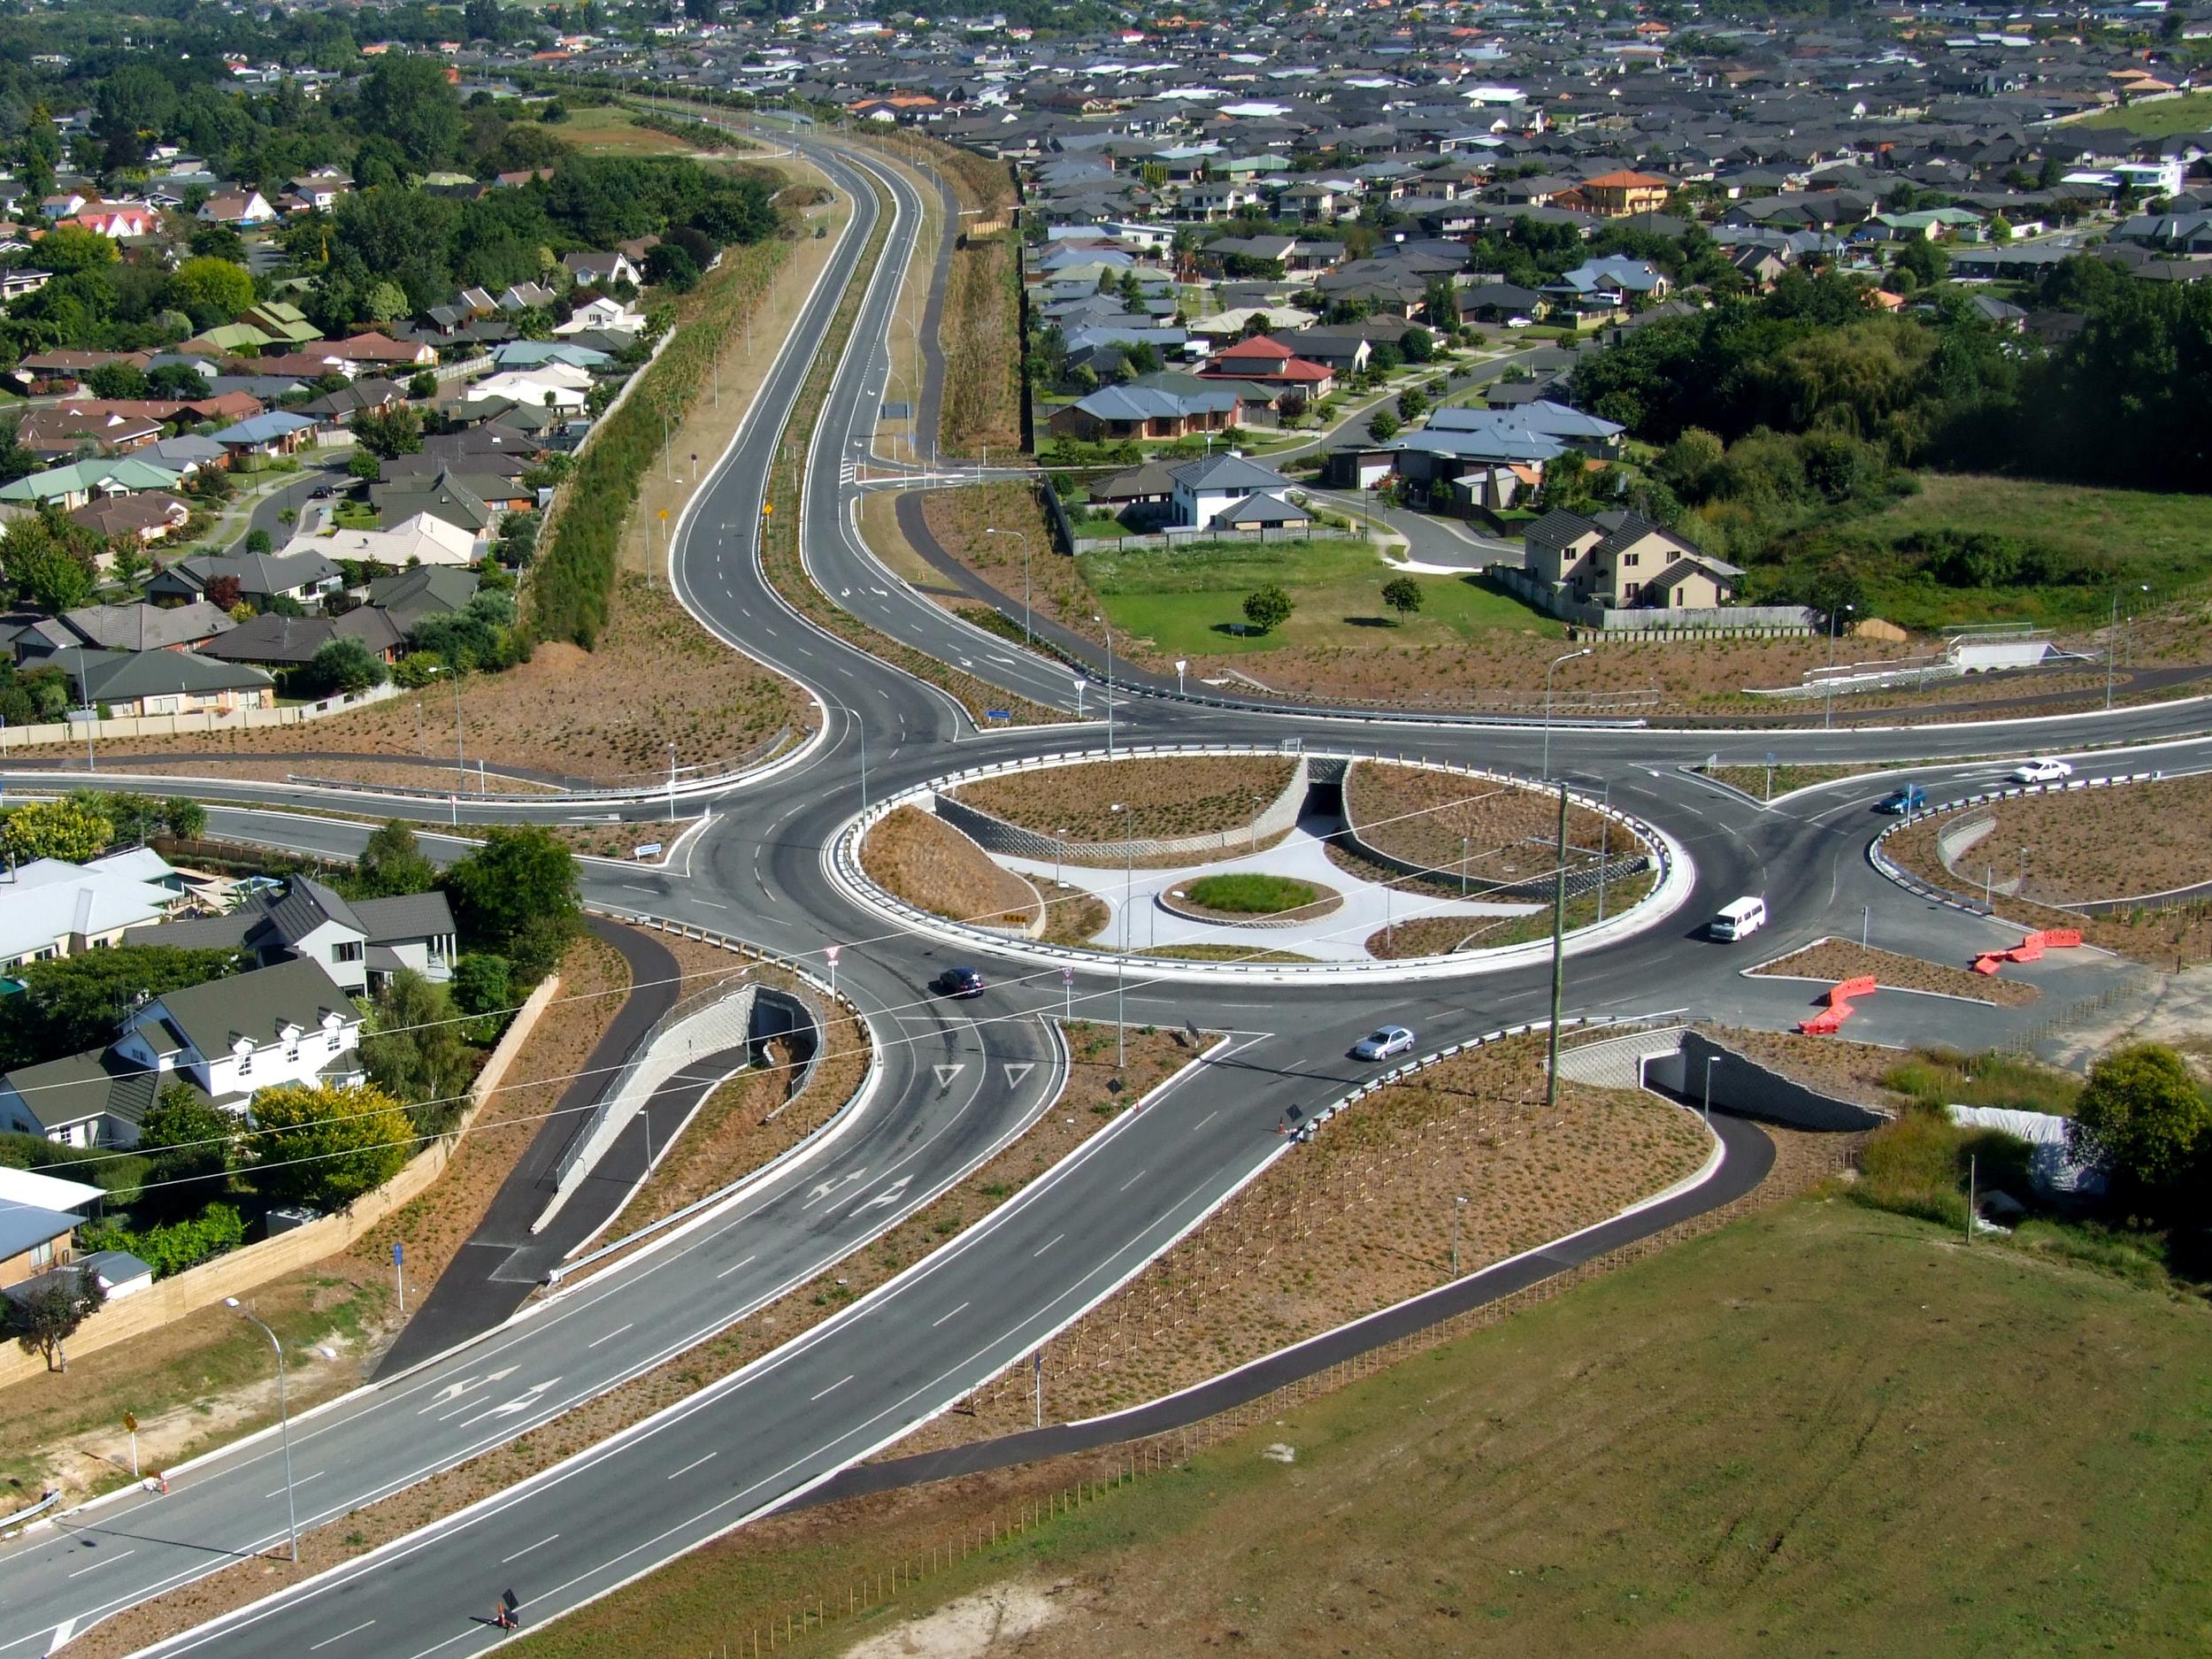 Wairere Drive Roundabout_Transportation_NZ014.jpg